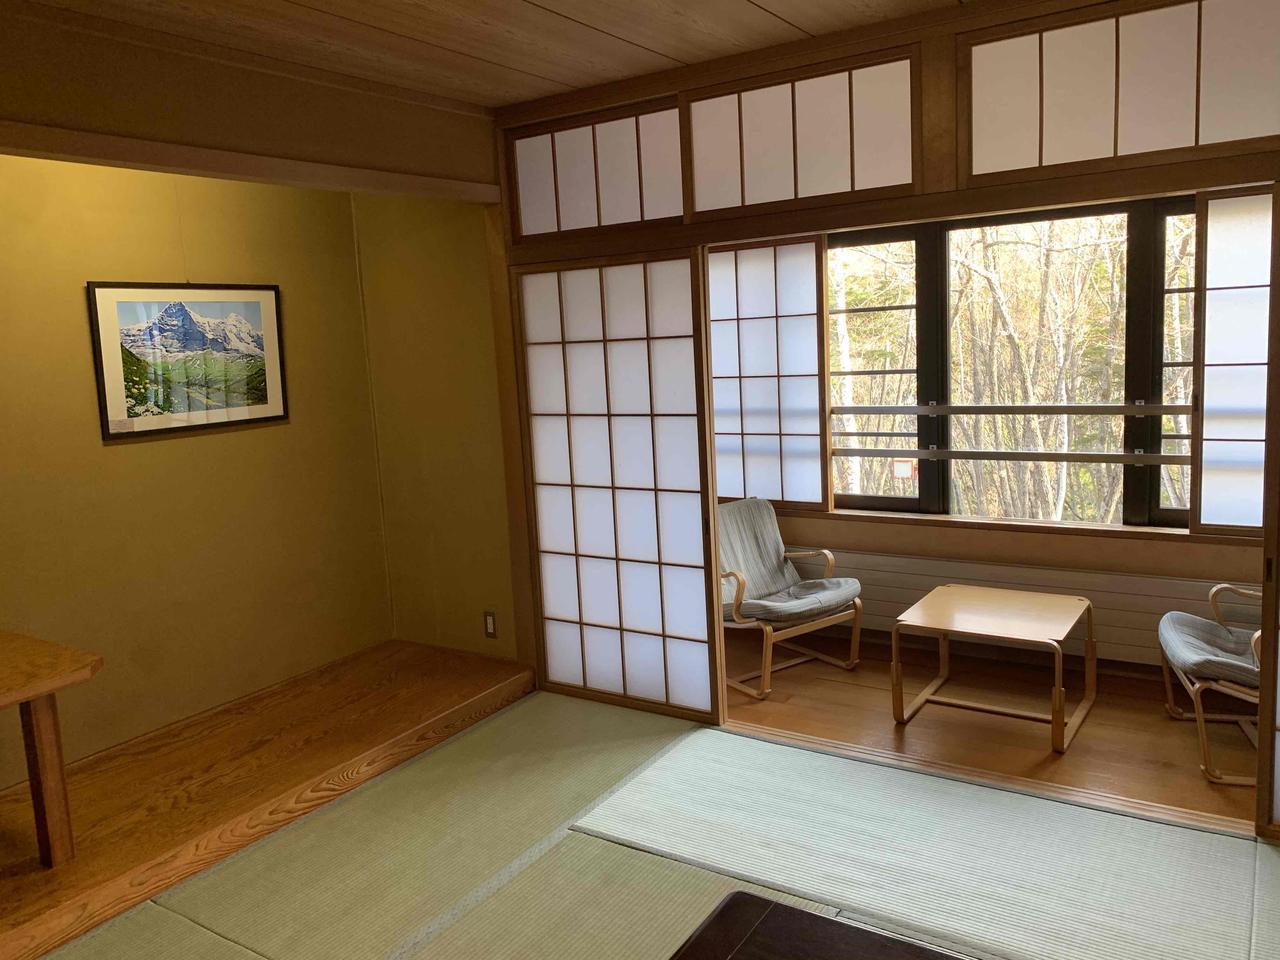 画像: 部屋の一例